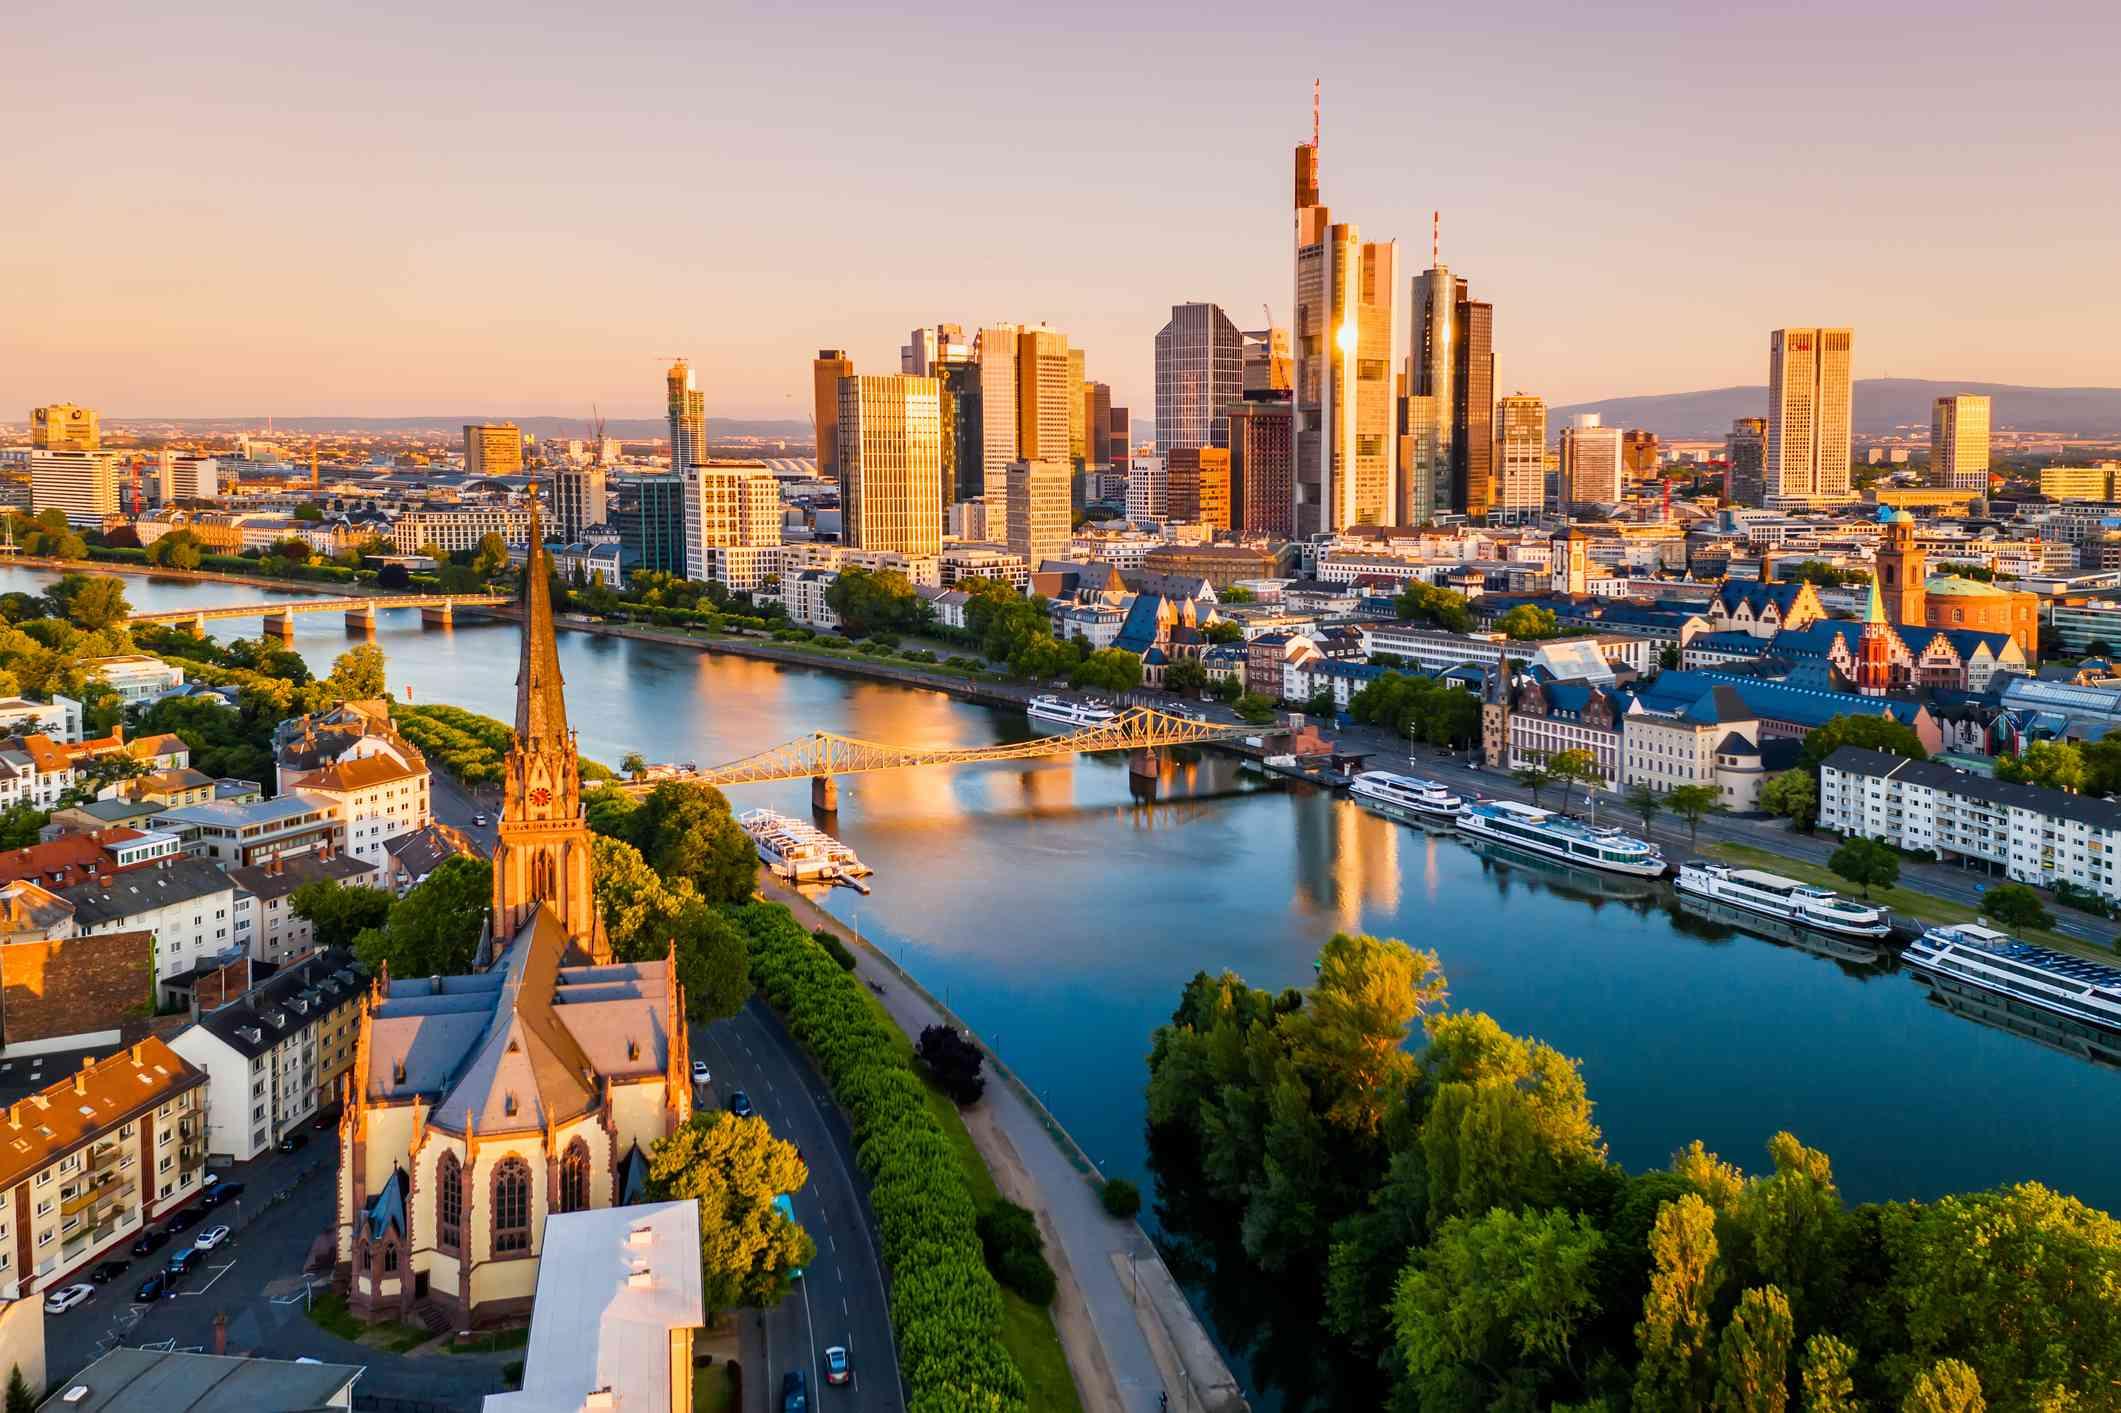 The city of Frankfurt, Germany at sunrise